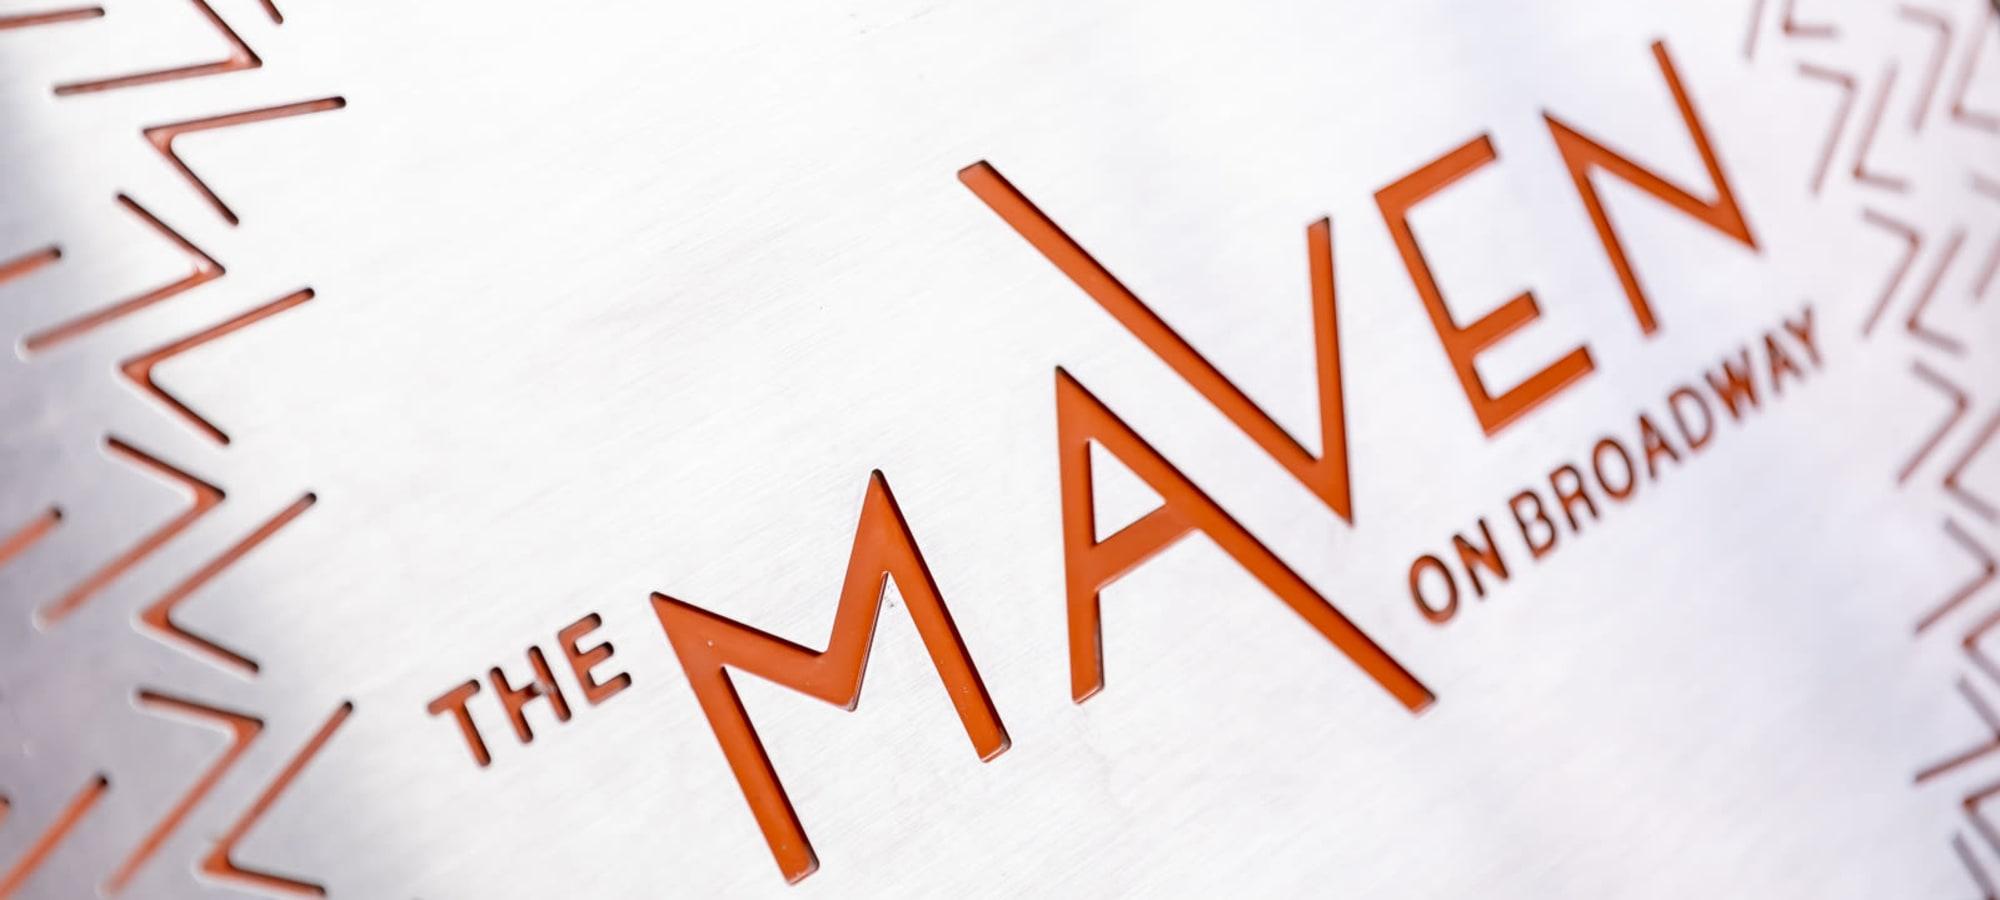 The Maven on Broadway, Minnesota The Maven on Broadway manhole cover